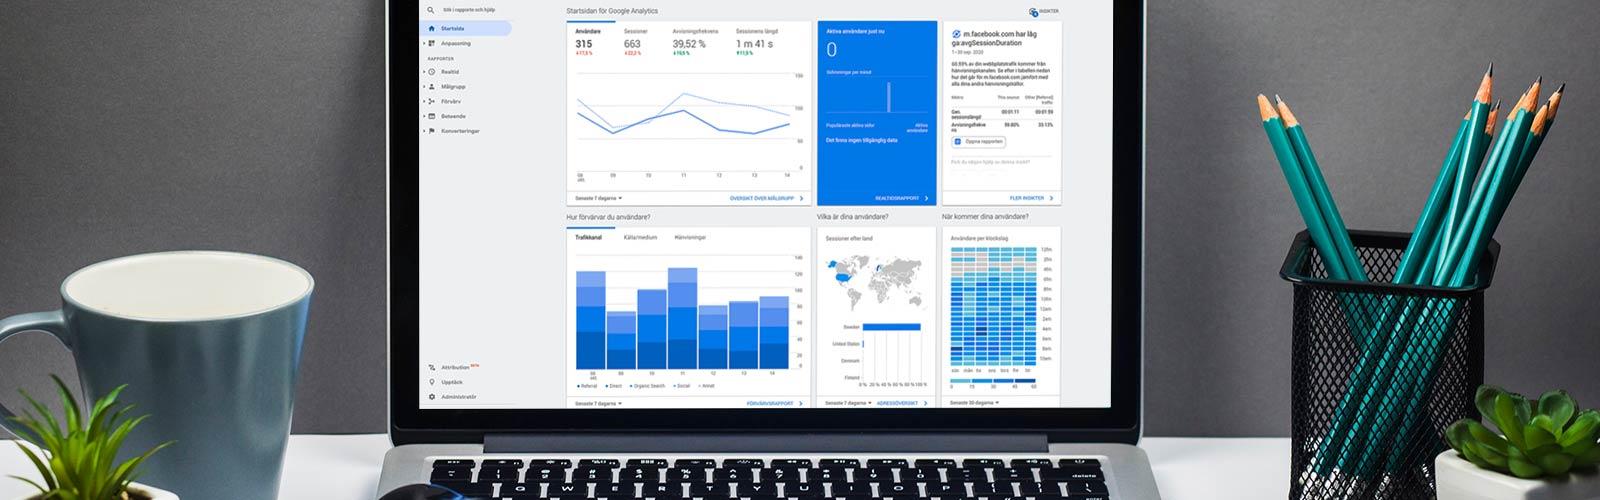 Google Analytics Analys webbstatistik